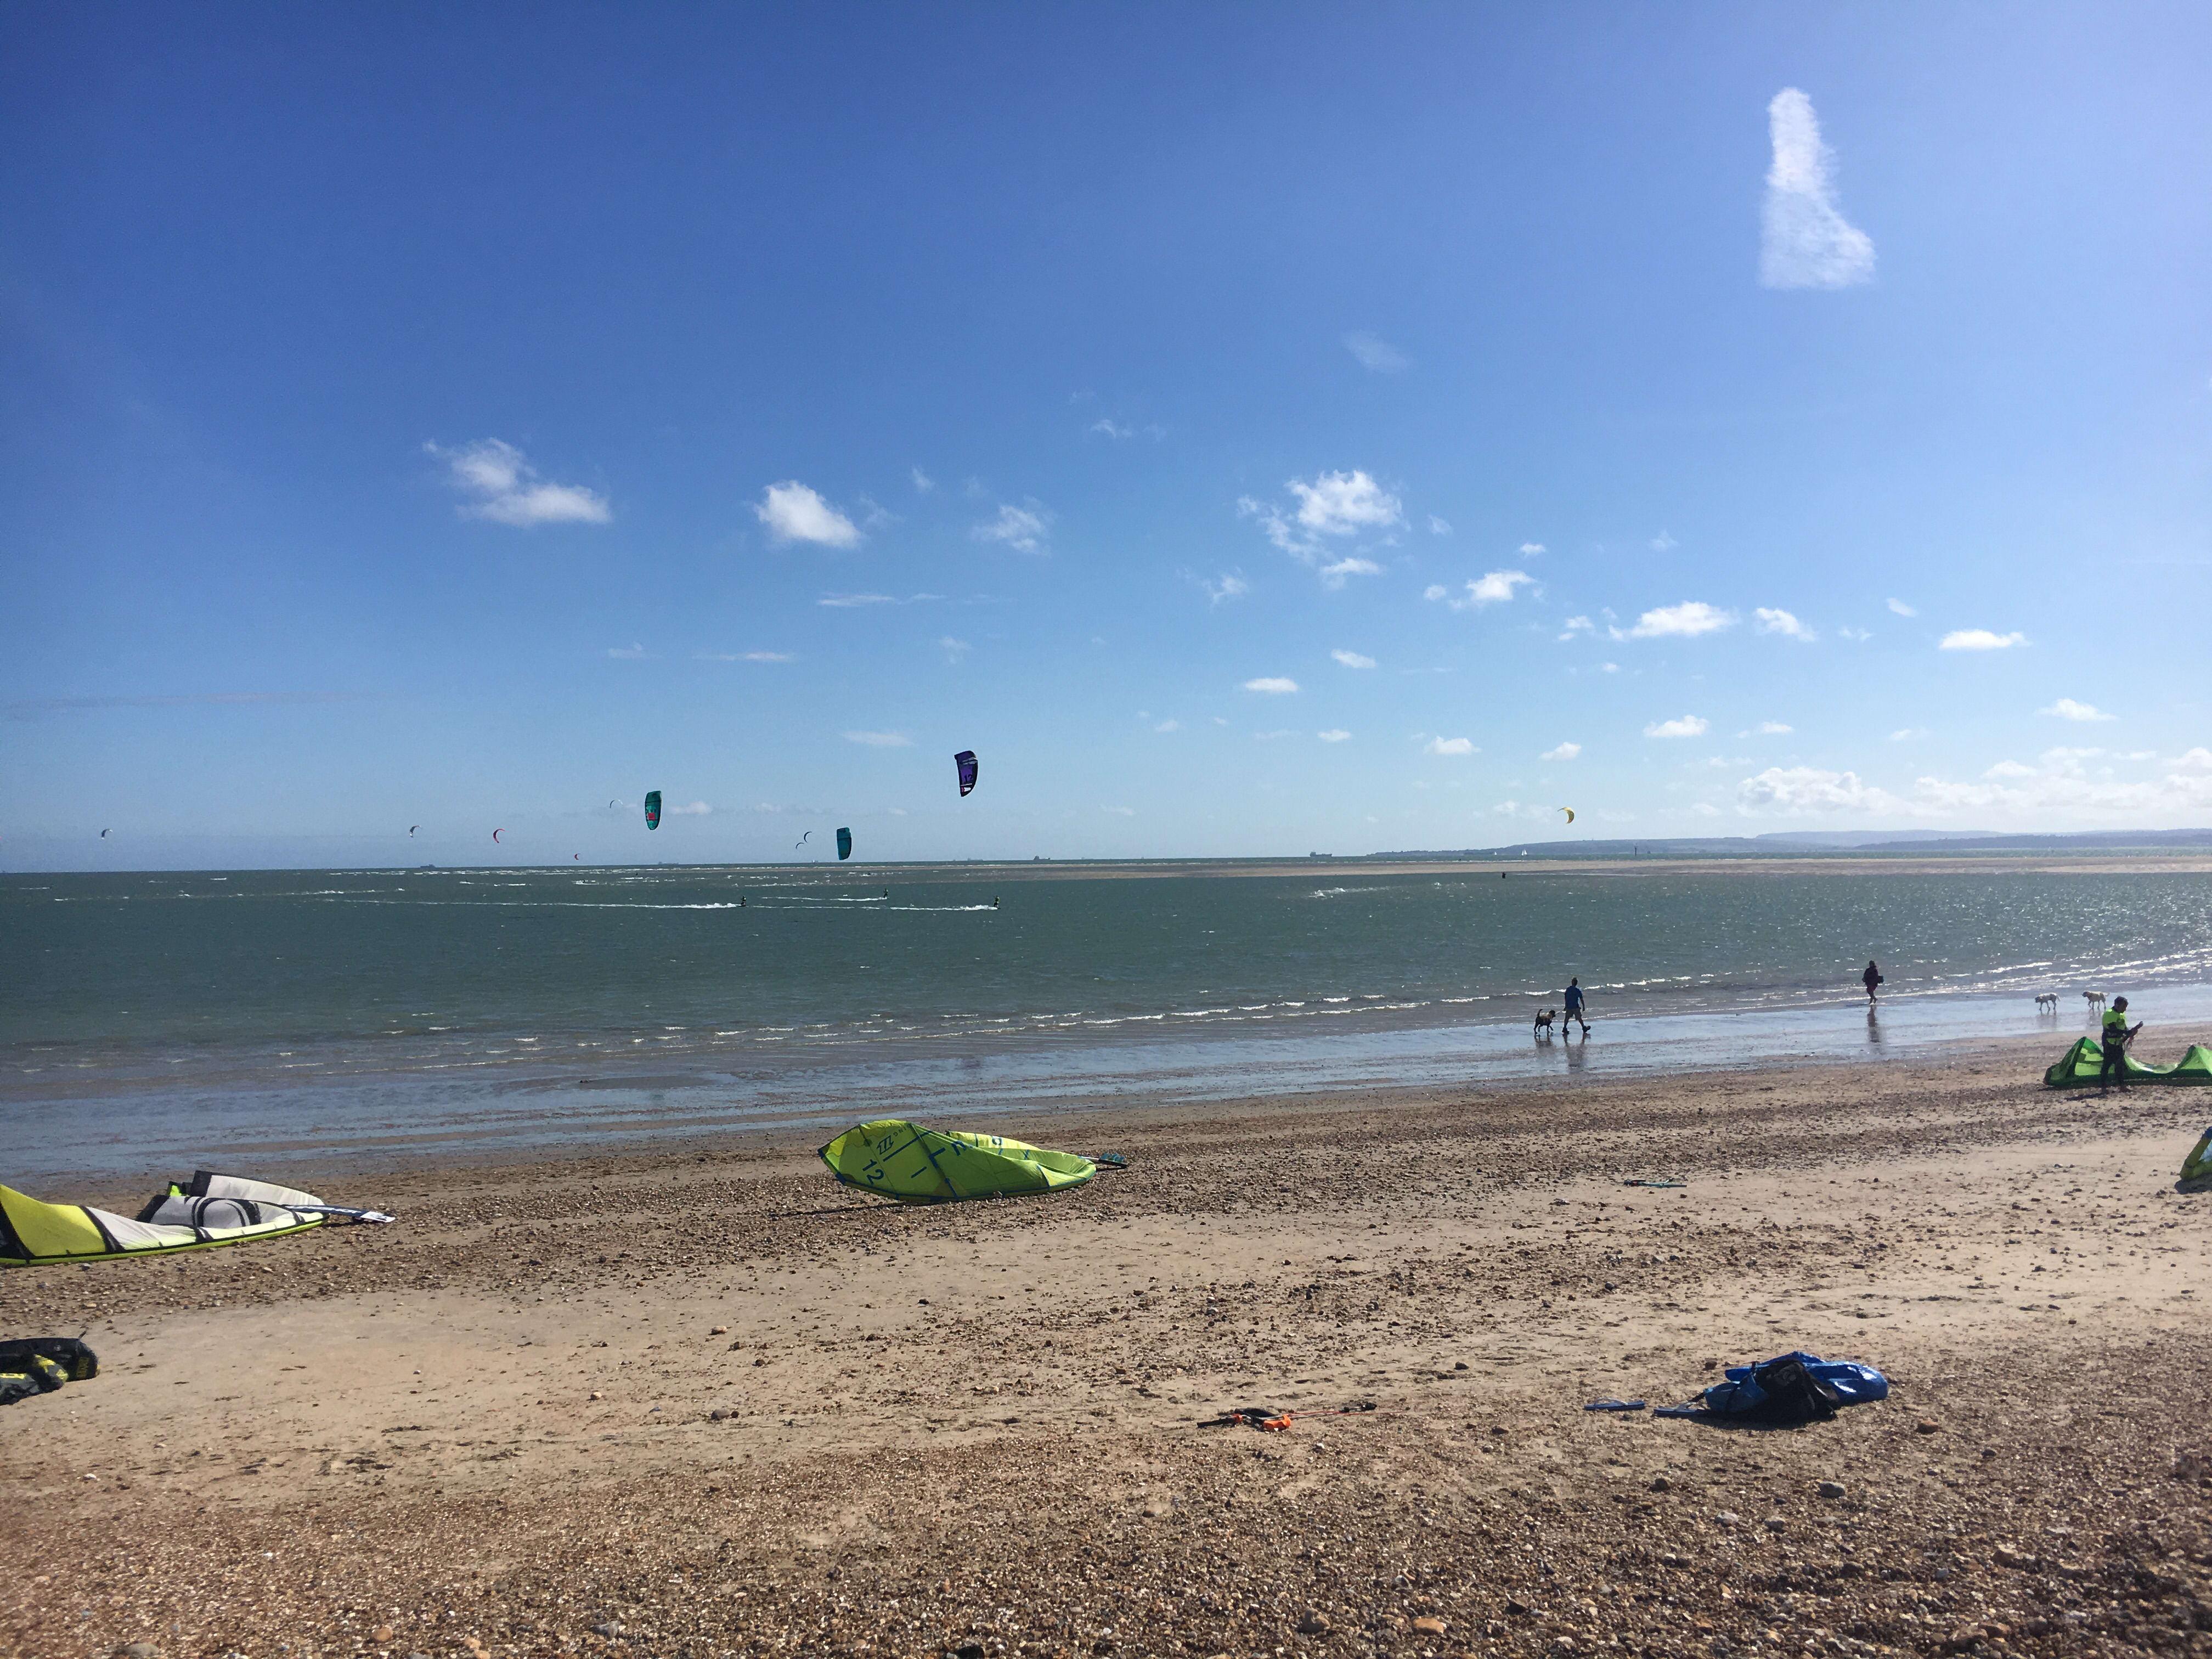 Kitesurfing in Hayling Island